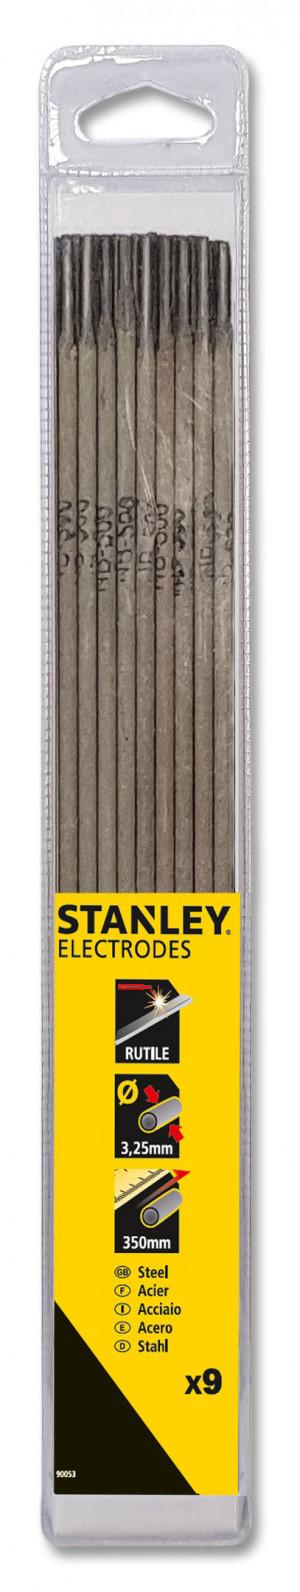 Stanley elektroder rutile 4,0 mm 8 stk.